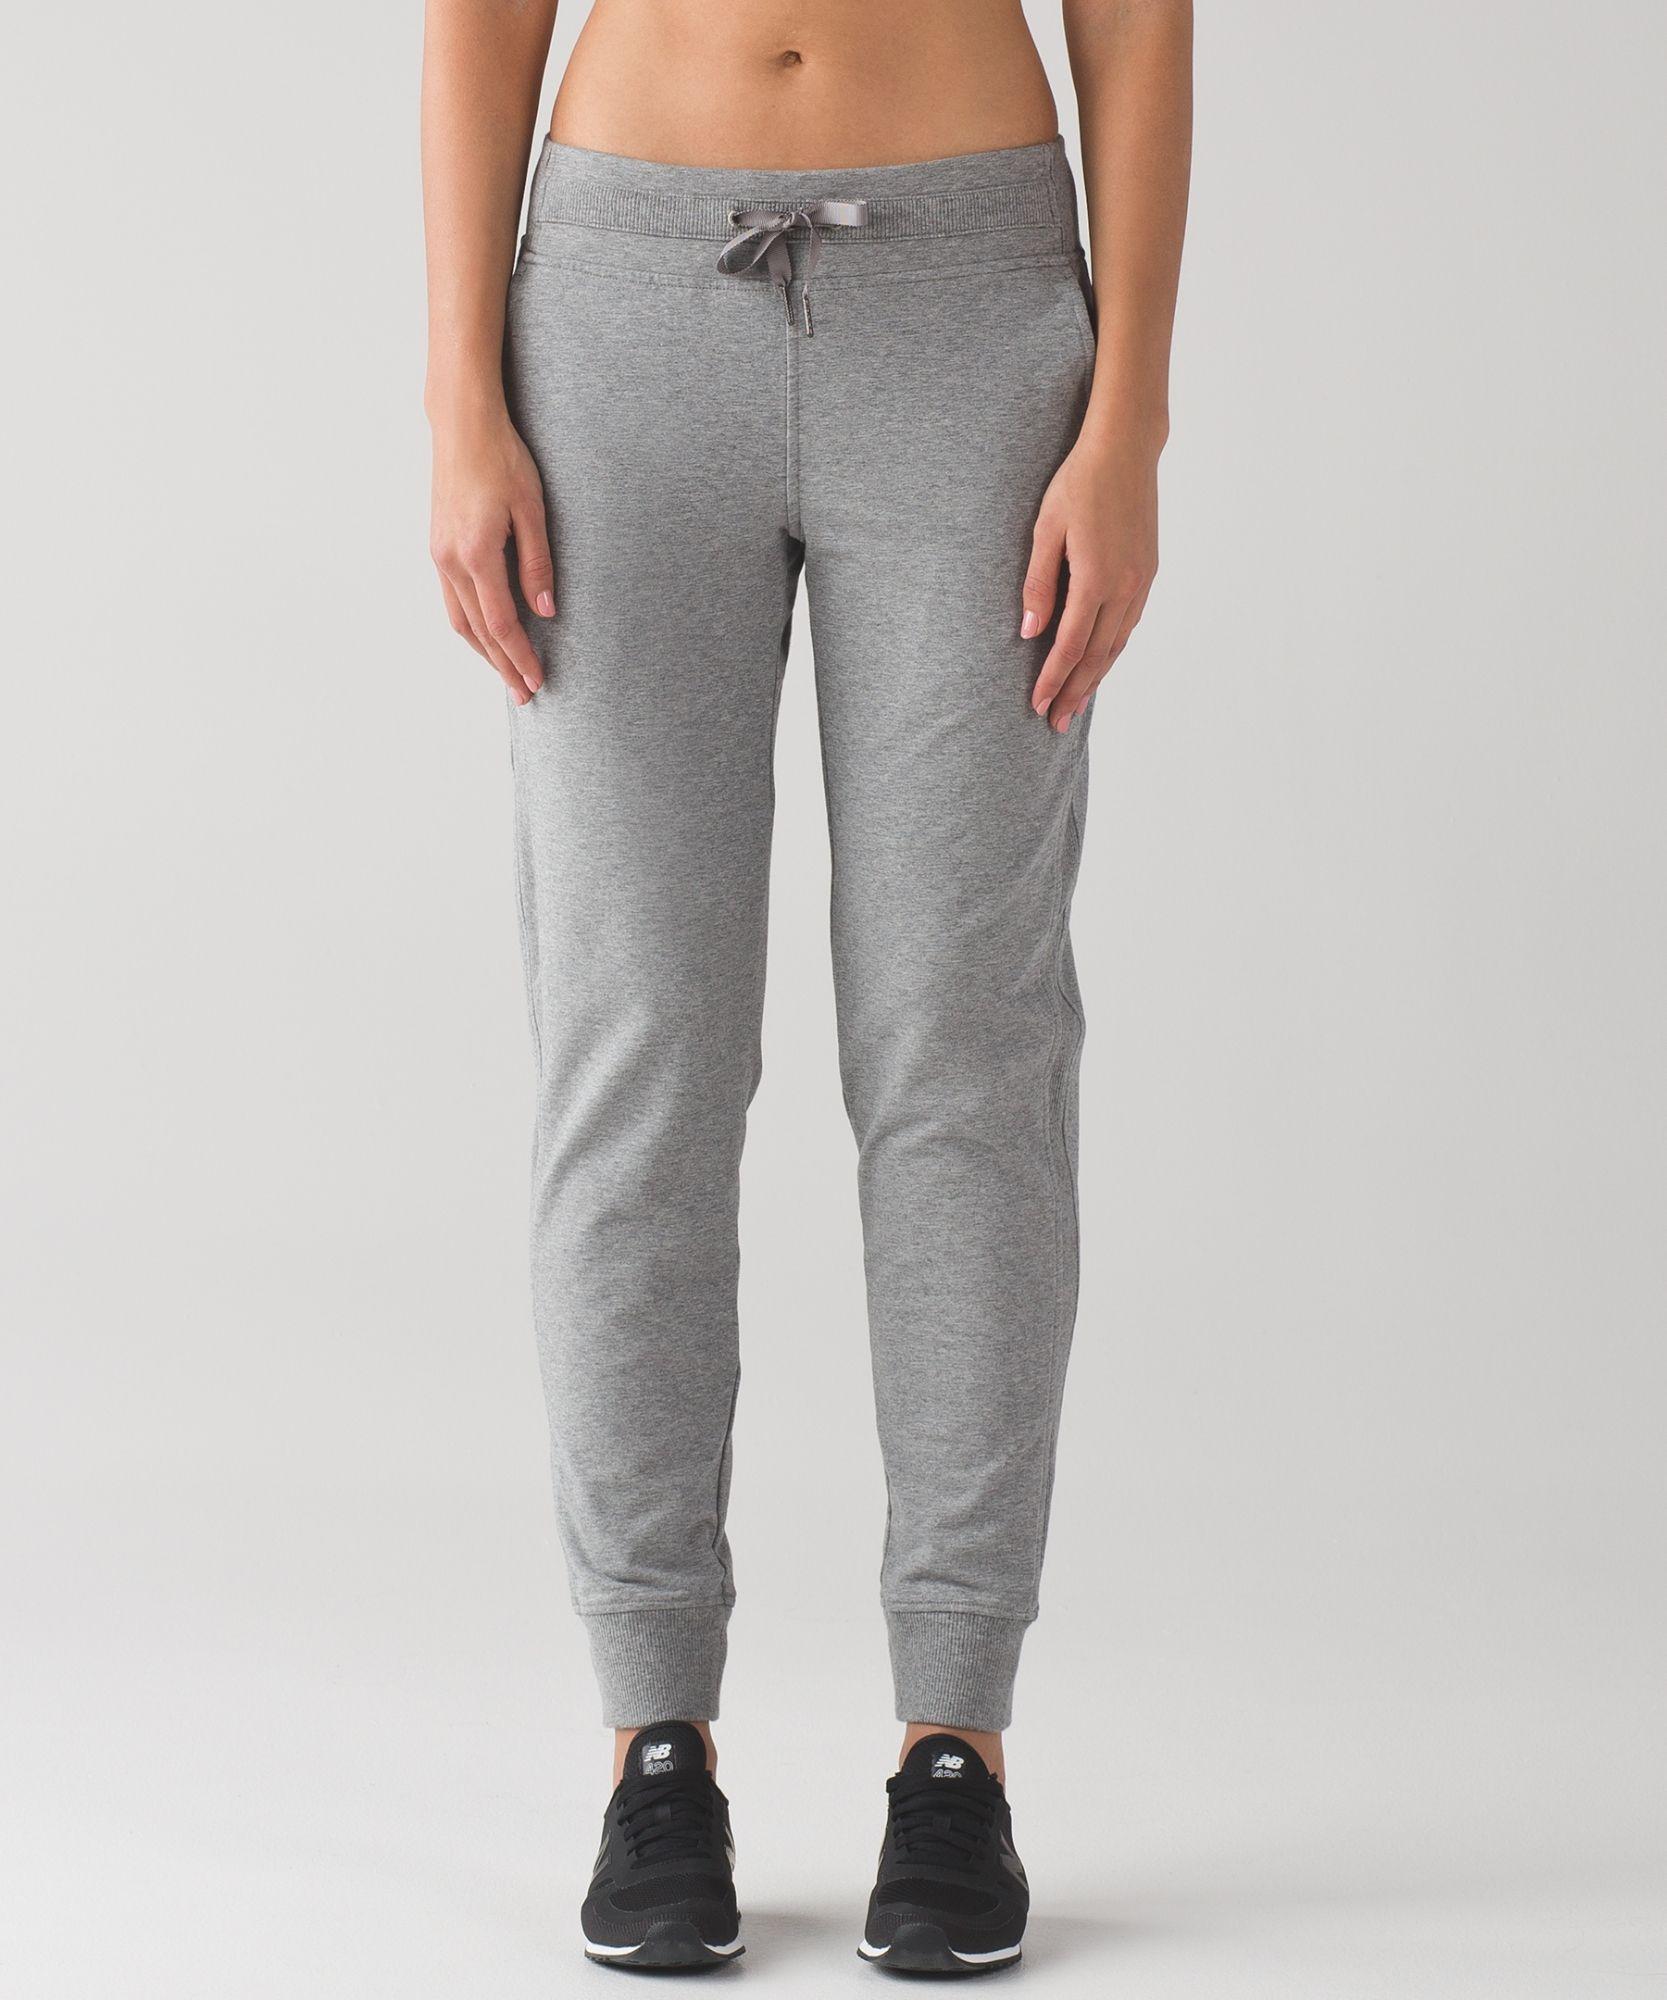 19293209202f0 fleece please jogger *terry | women's pants | lululemon athletica ...